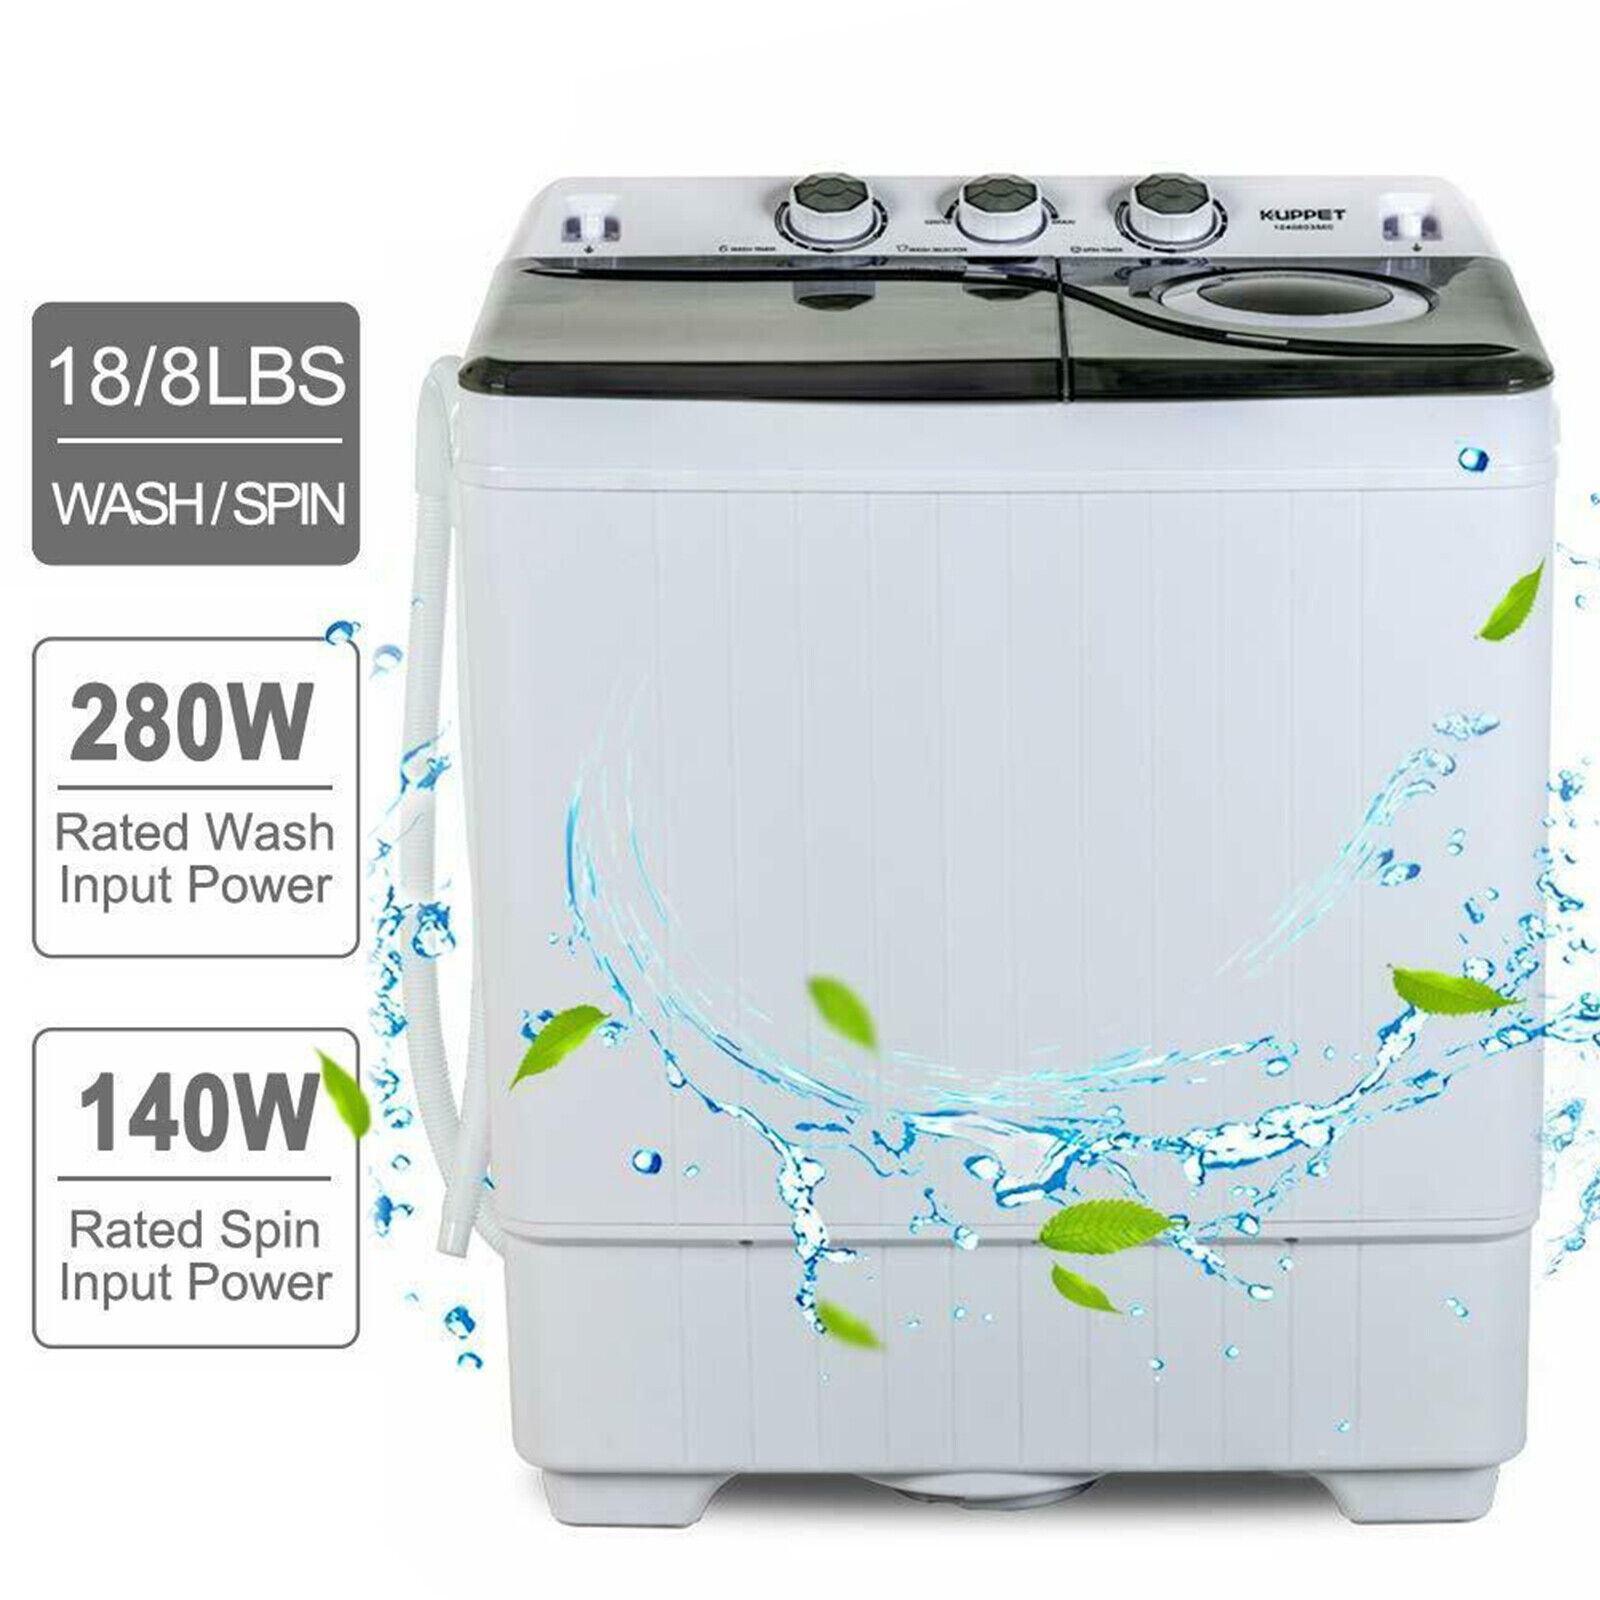 26 LBS Compact Washing Machine Portable Twin Tub Laundry Spi